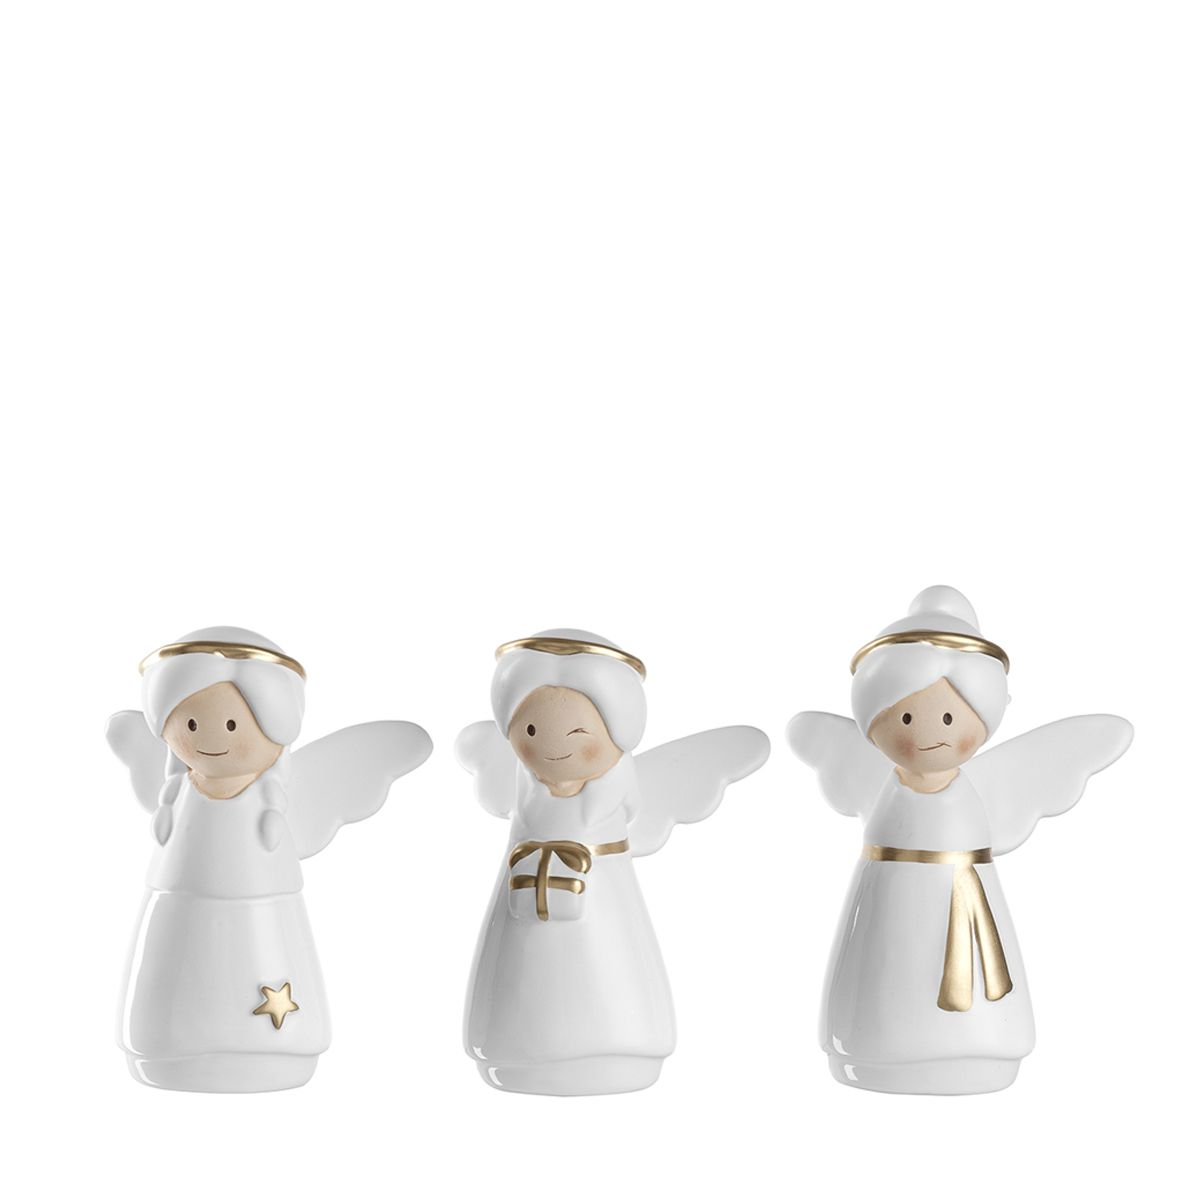 Noël or et blanc   Figurines anges